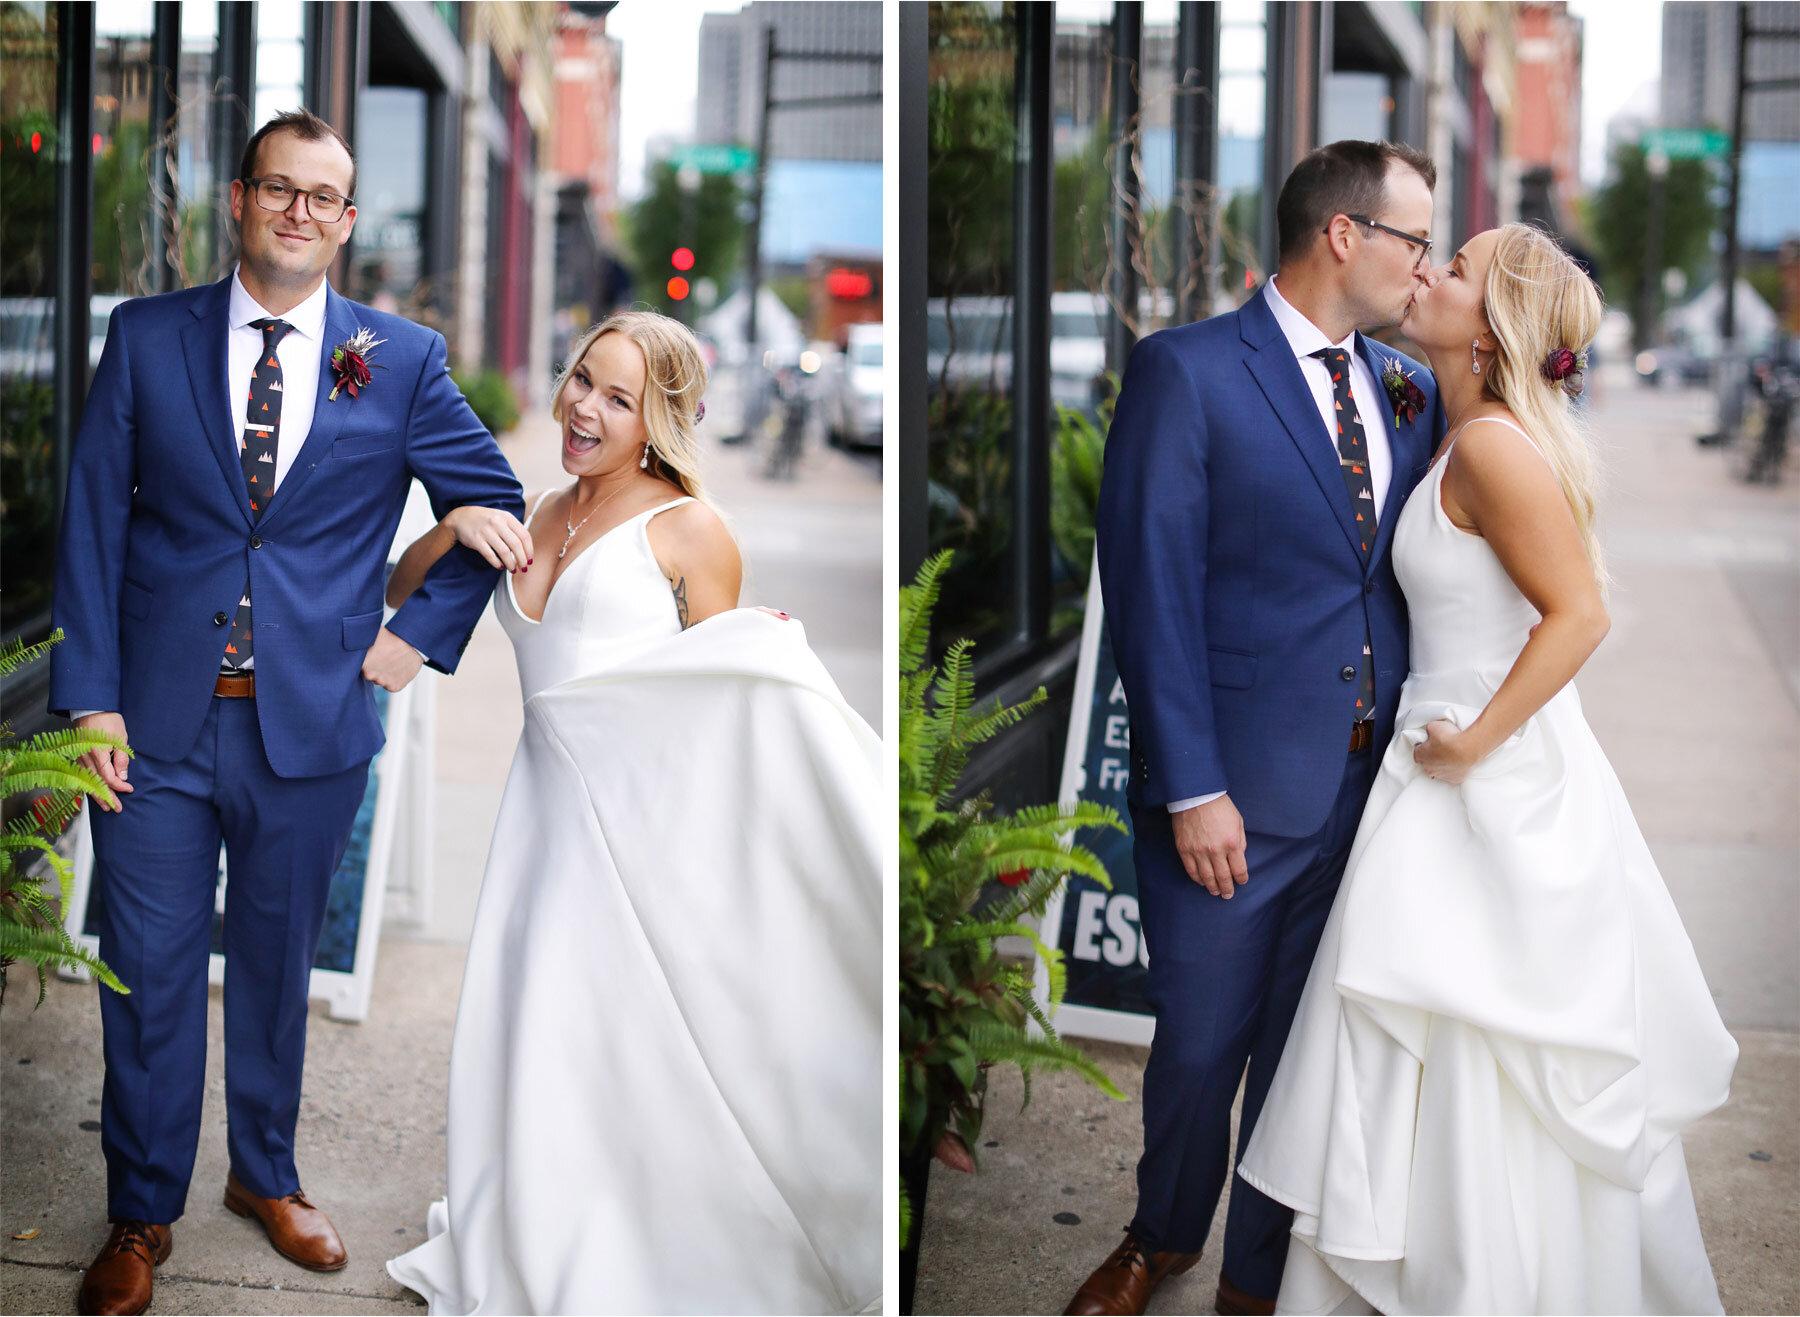 12-Vick-Photography-Wedding-Minneapolis-Minnesota-Bride-Groom-Danielle-and-Tom.jpg